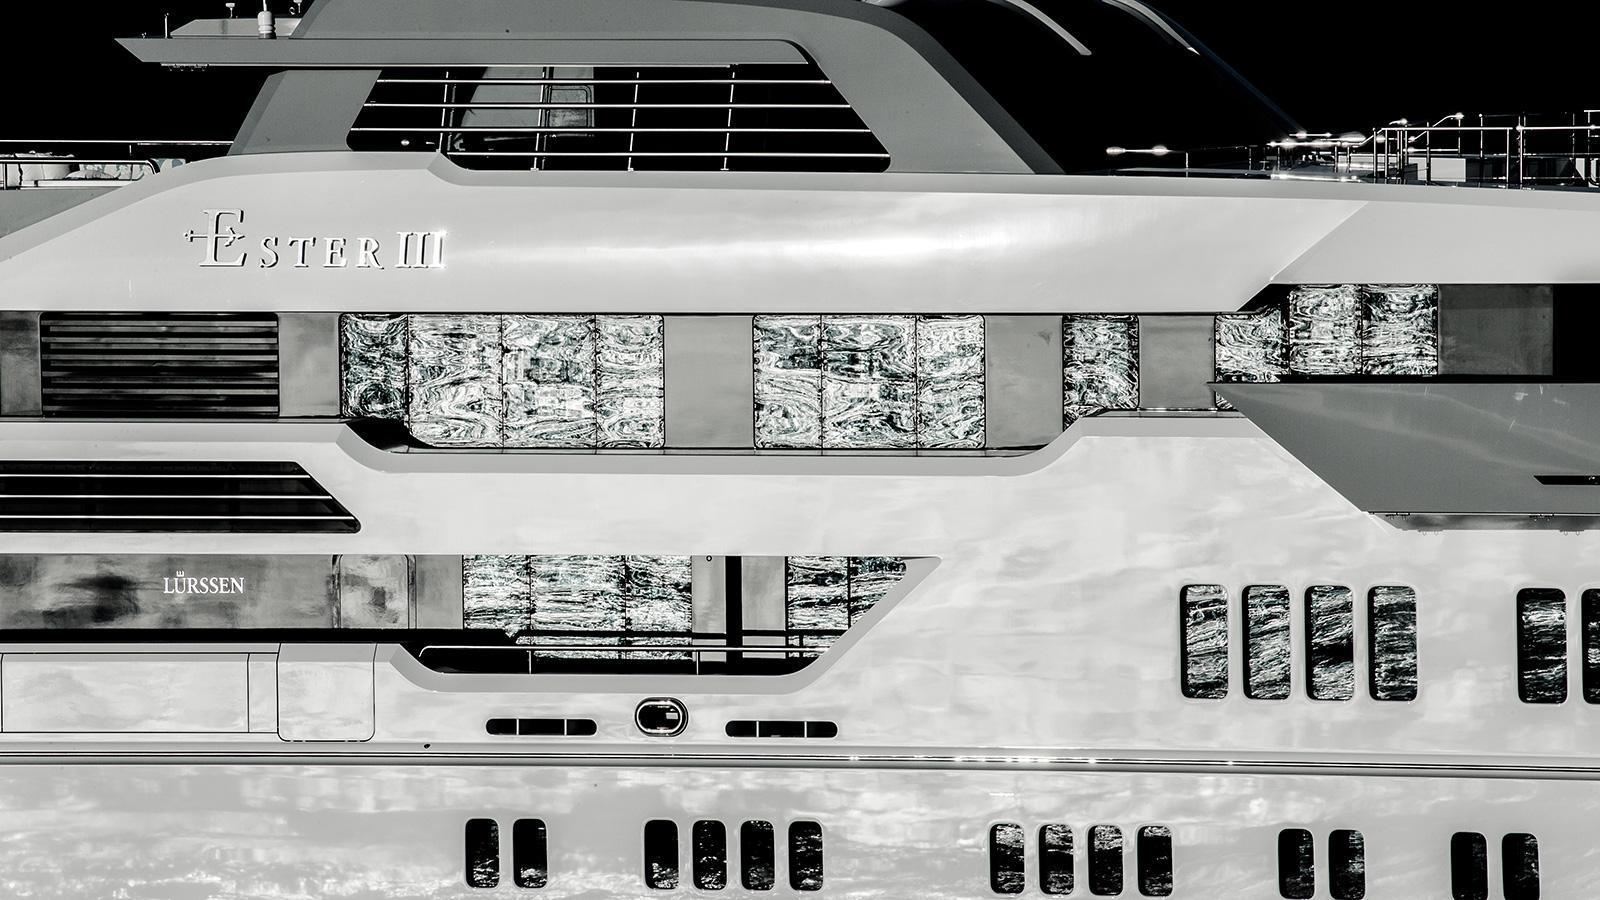 iroquois ester iii motor yacht lurssen 2014 66m details profile